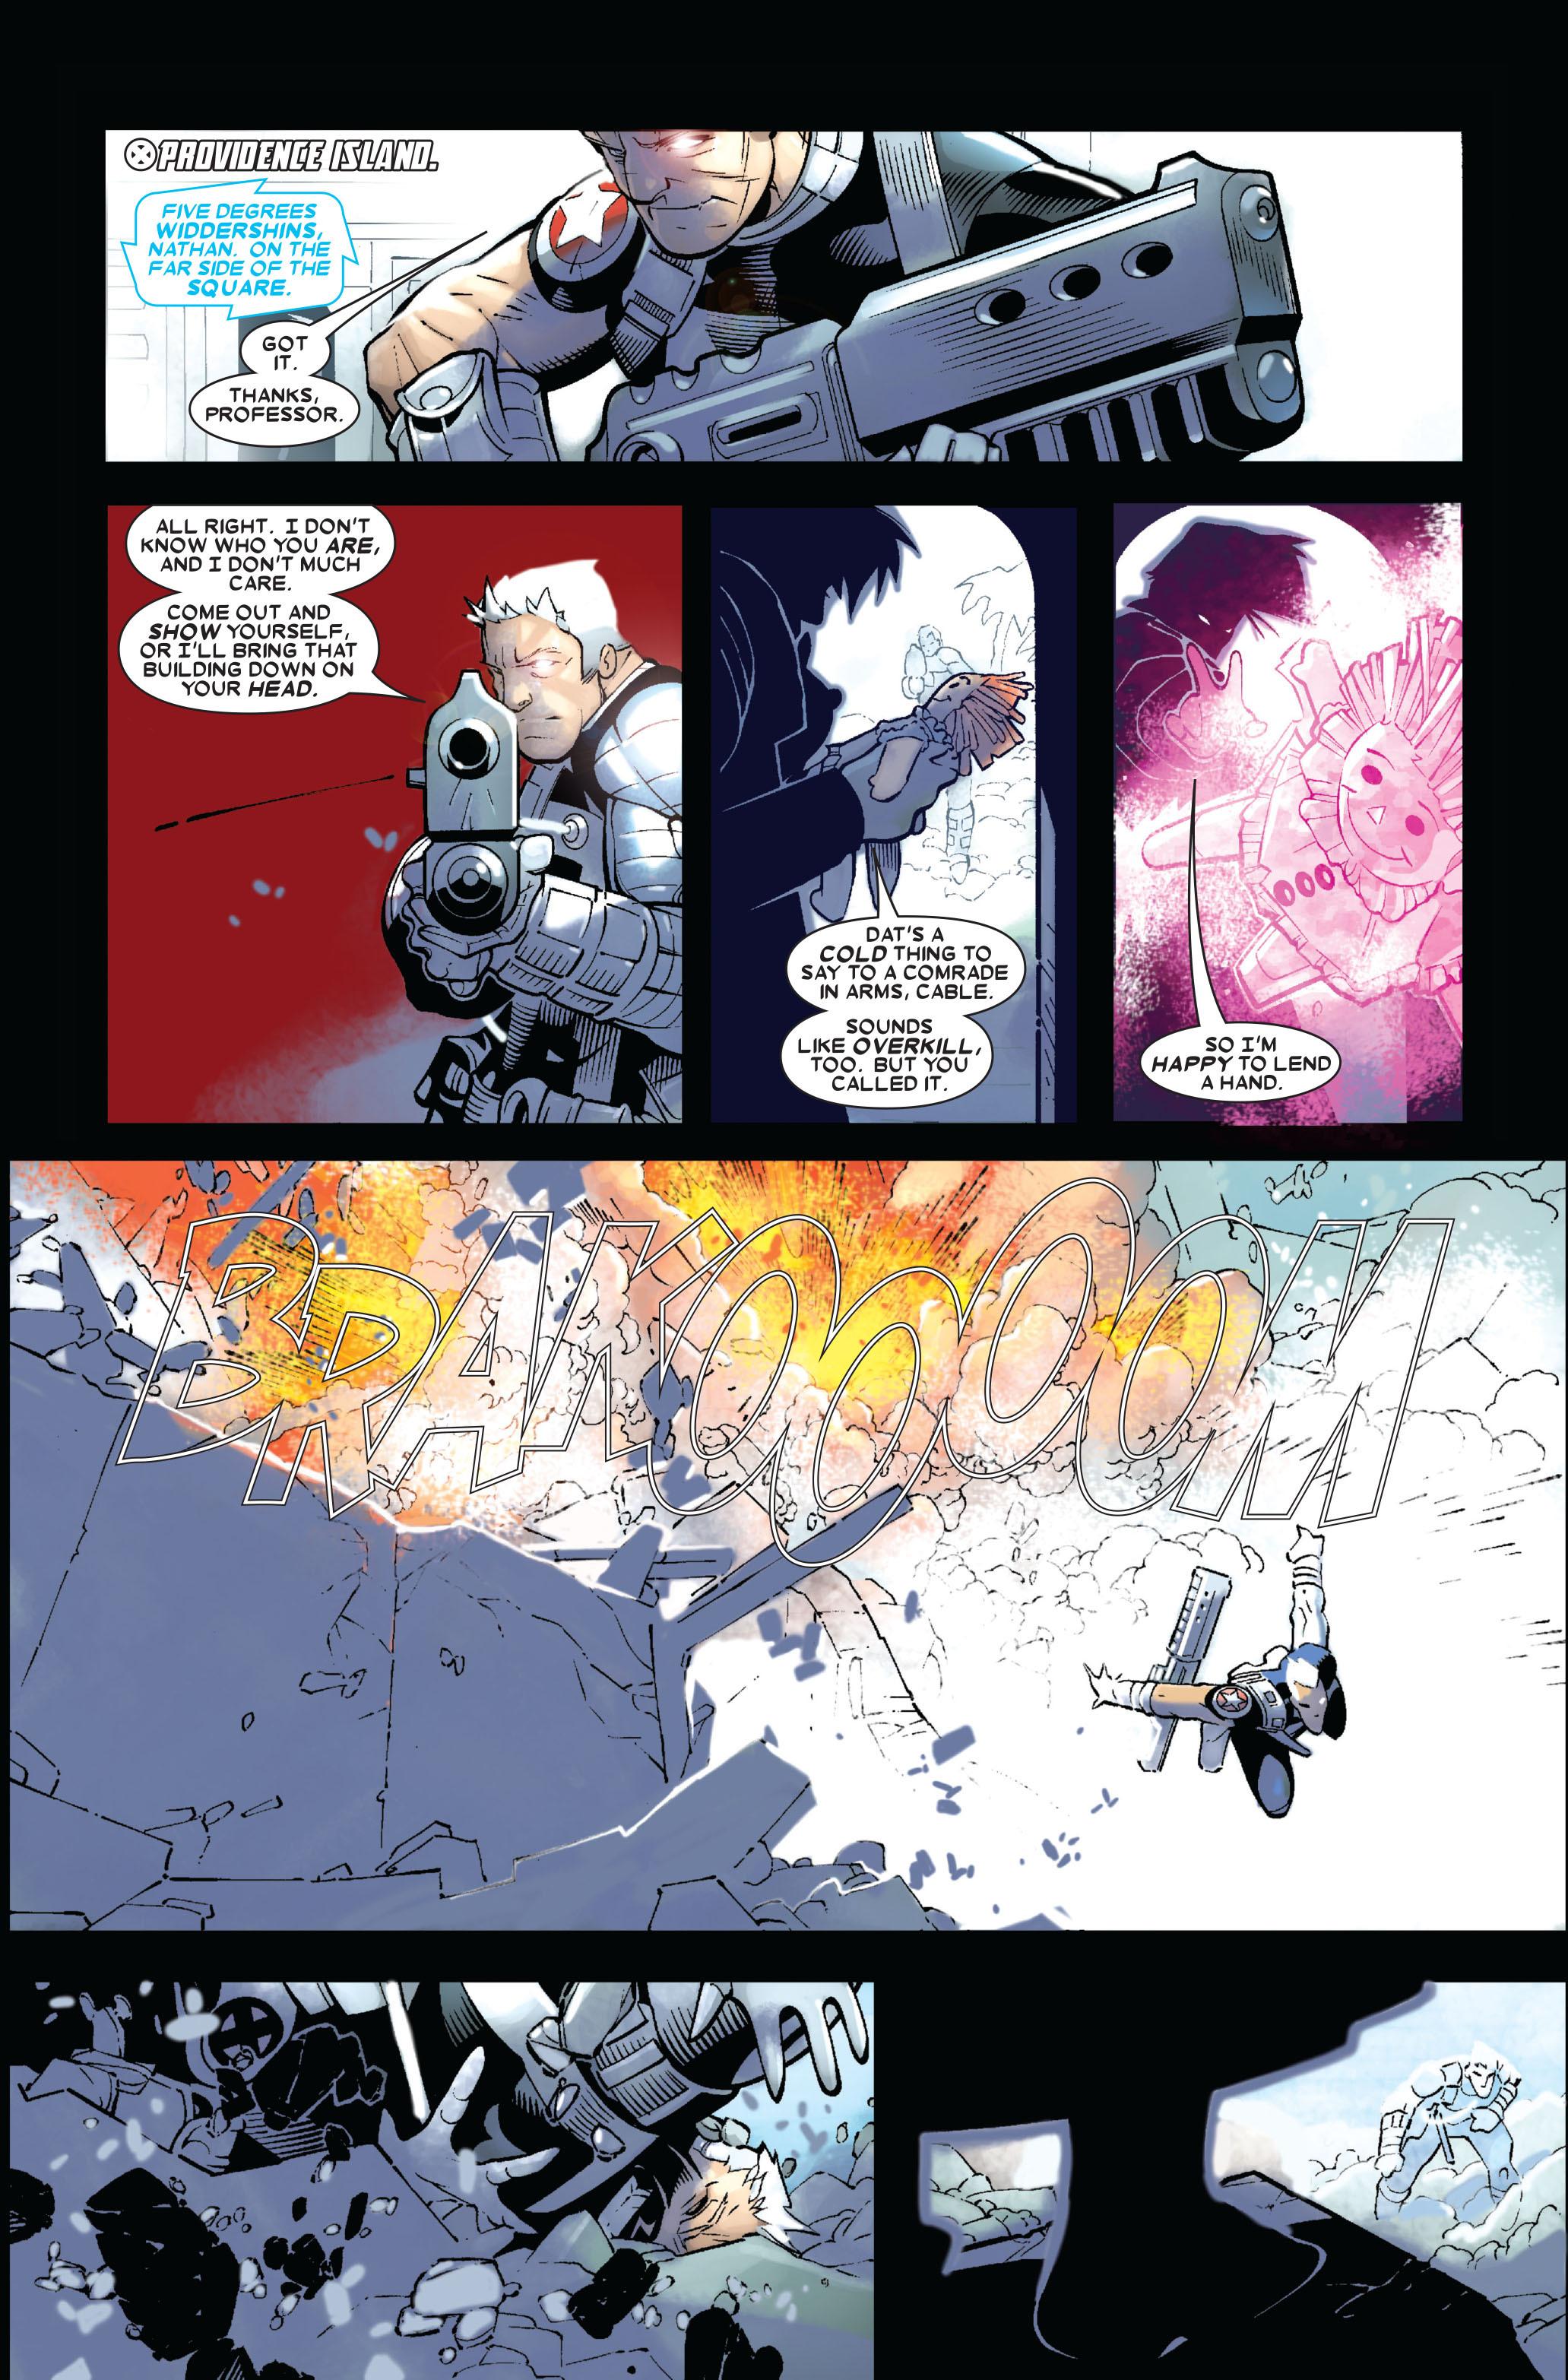 X-Men (1991) 200 Page 14